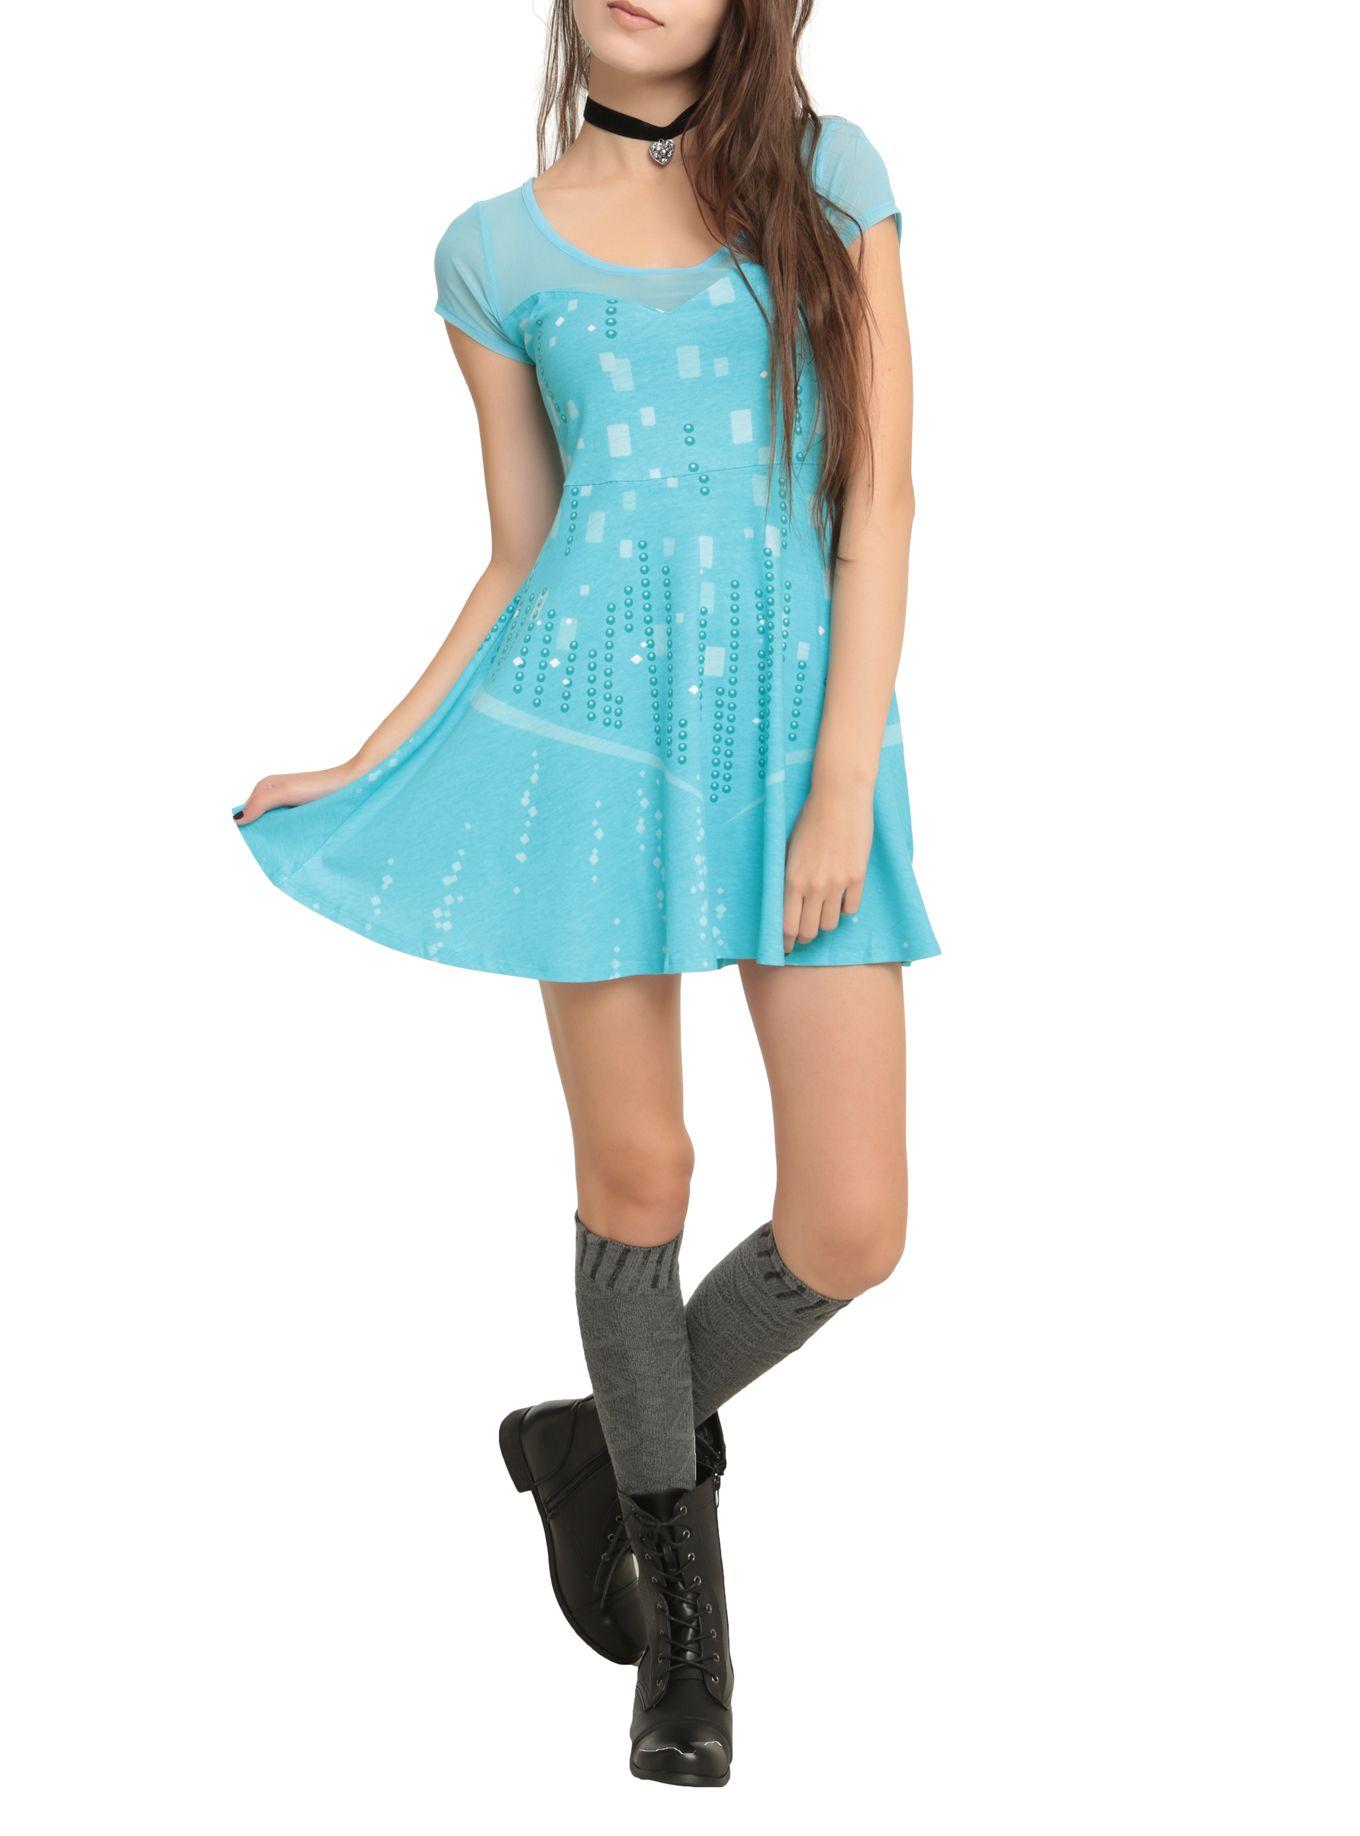 Disney Frozen Elsa Costume Dress | Hot Topic  sc 1 st  Pinterest & Disney Frozen Elsa Costume Dress | Hot Topic | disney fashion ...